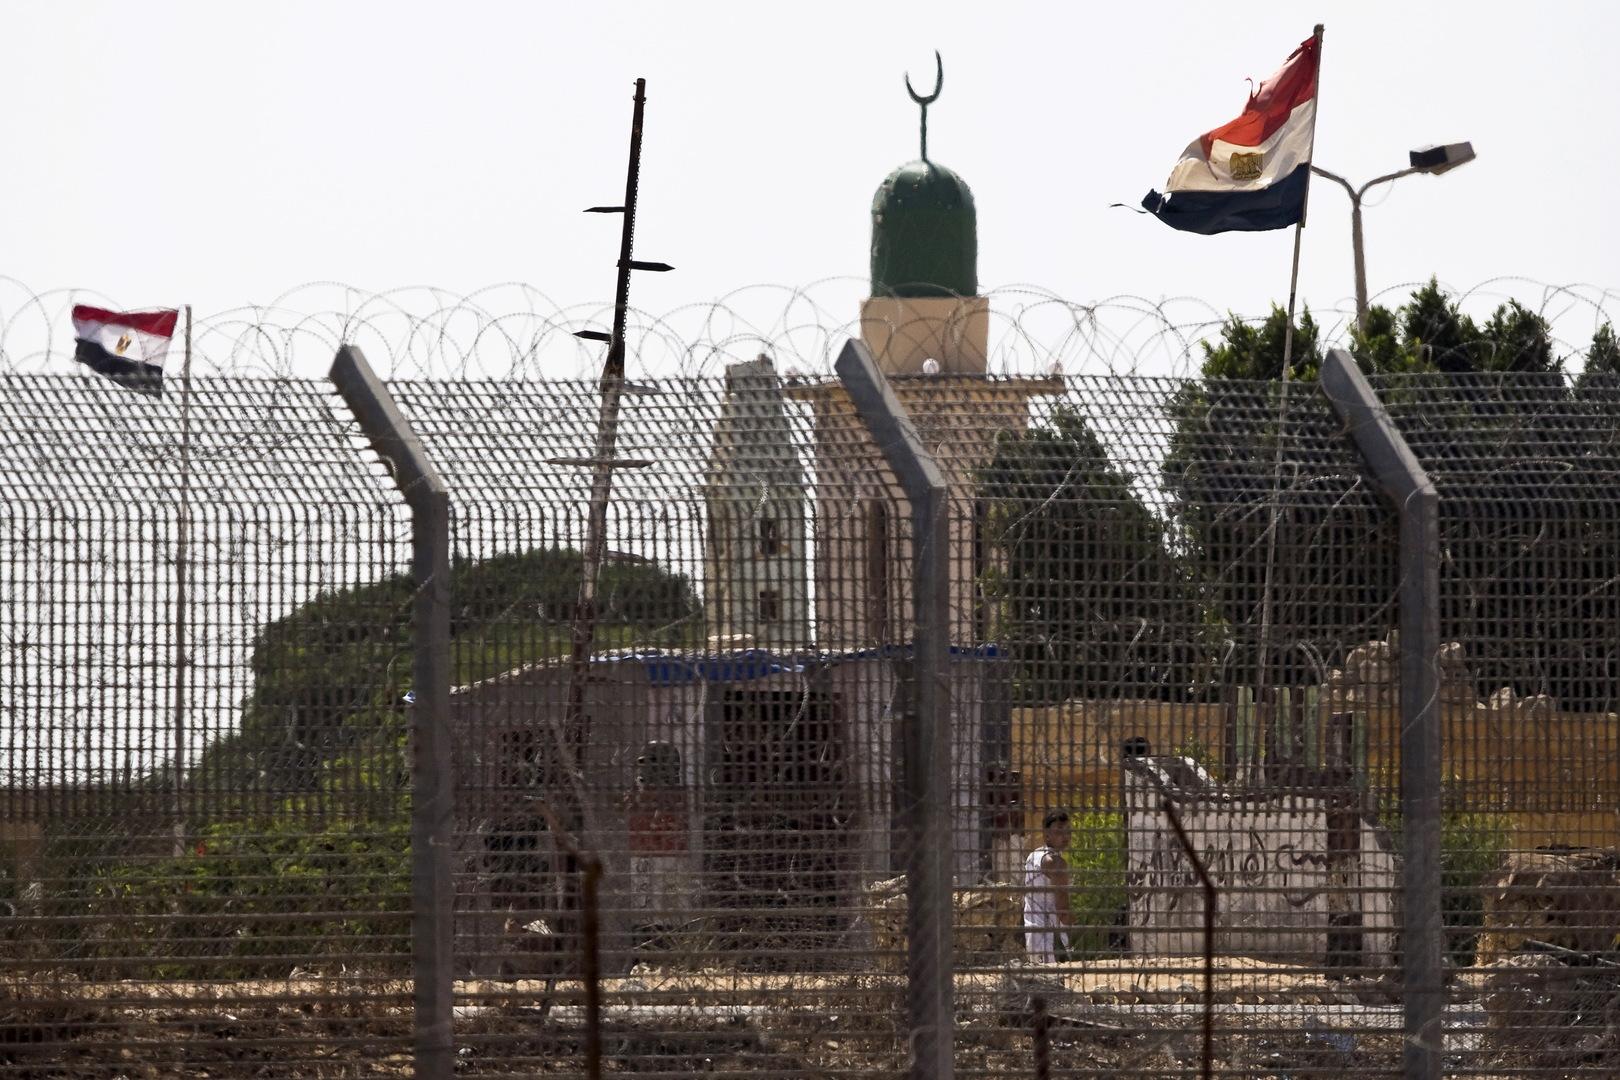 إسرائيل تغلق معابرها مع مصر والأردن